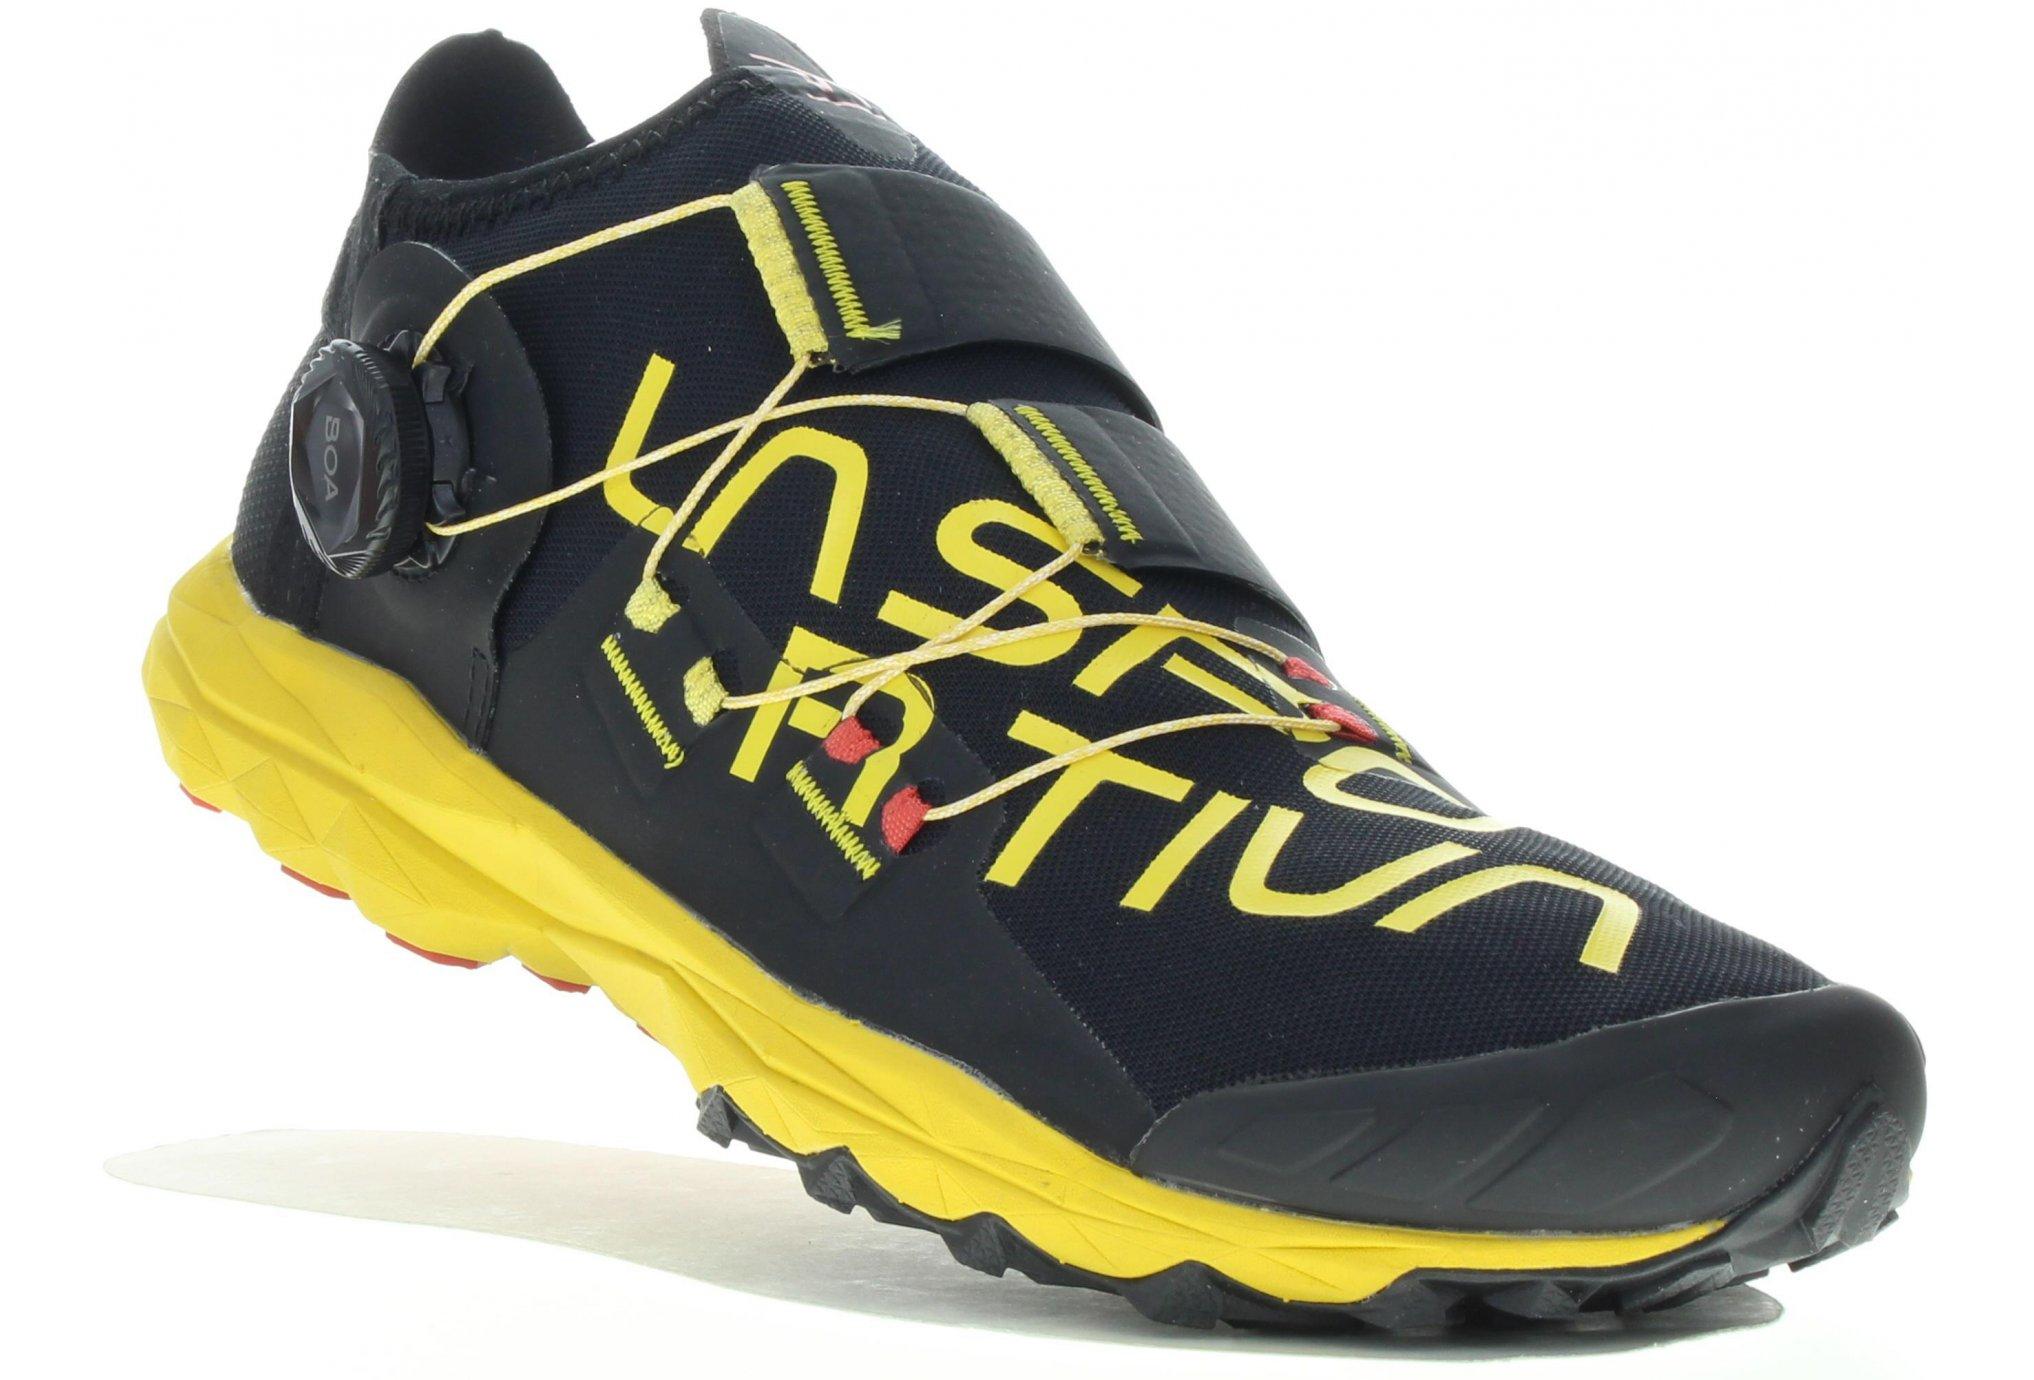 La Sportiva VK Boa Chaussures homme